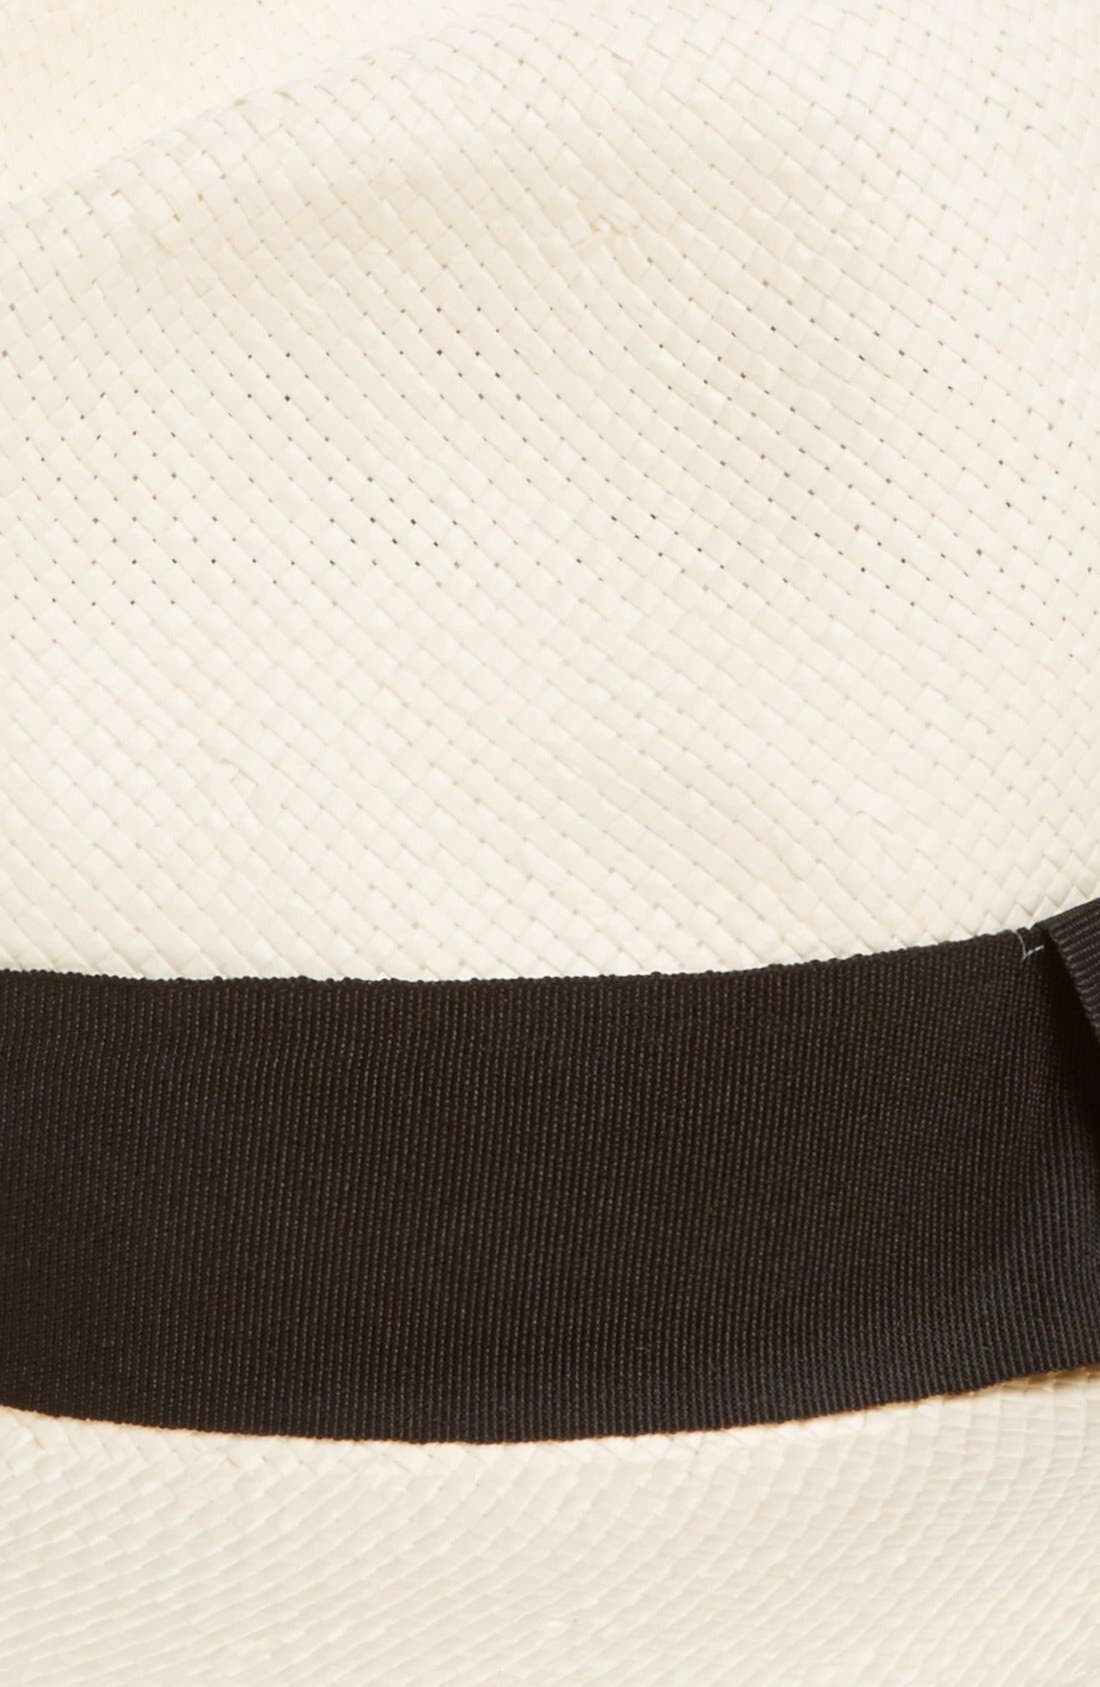 Alternate Image 2  - Michael Stars 'Well Weathered' Straw Panama Hat